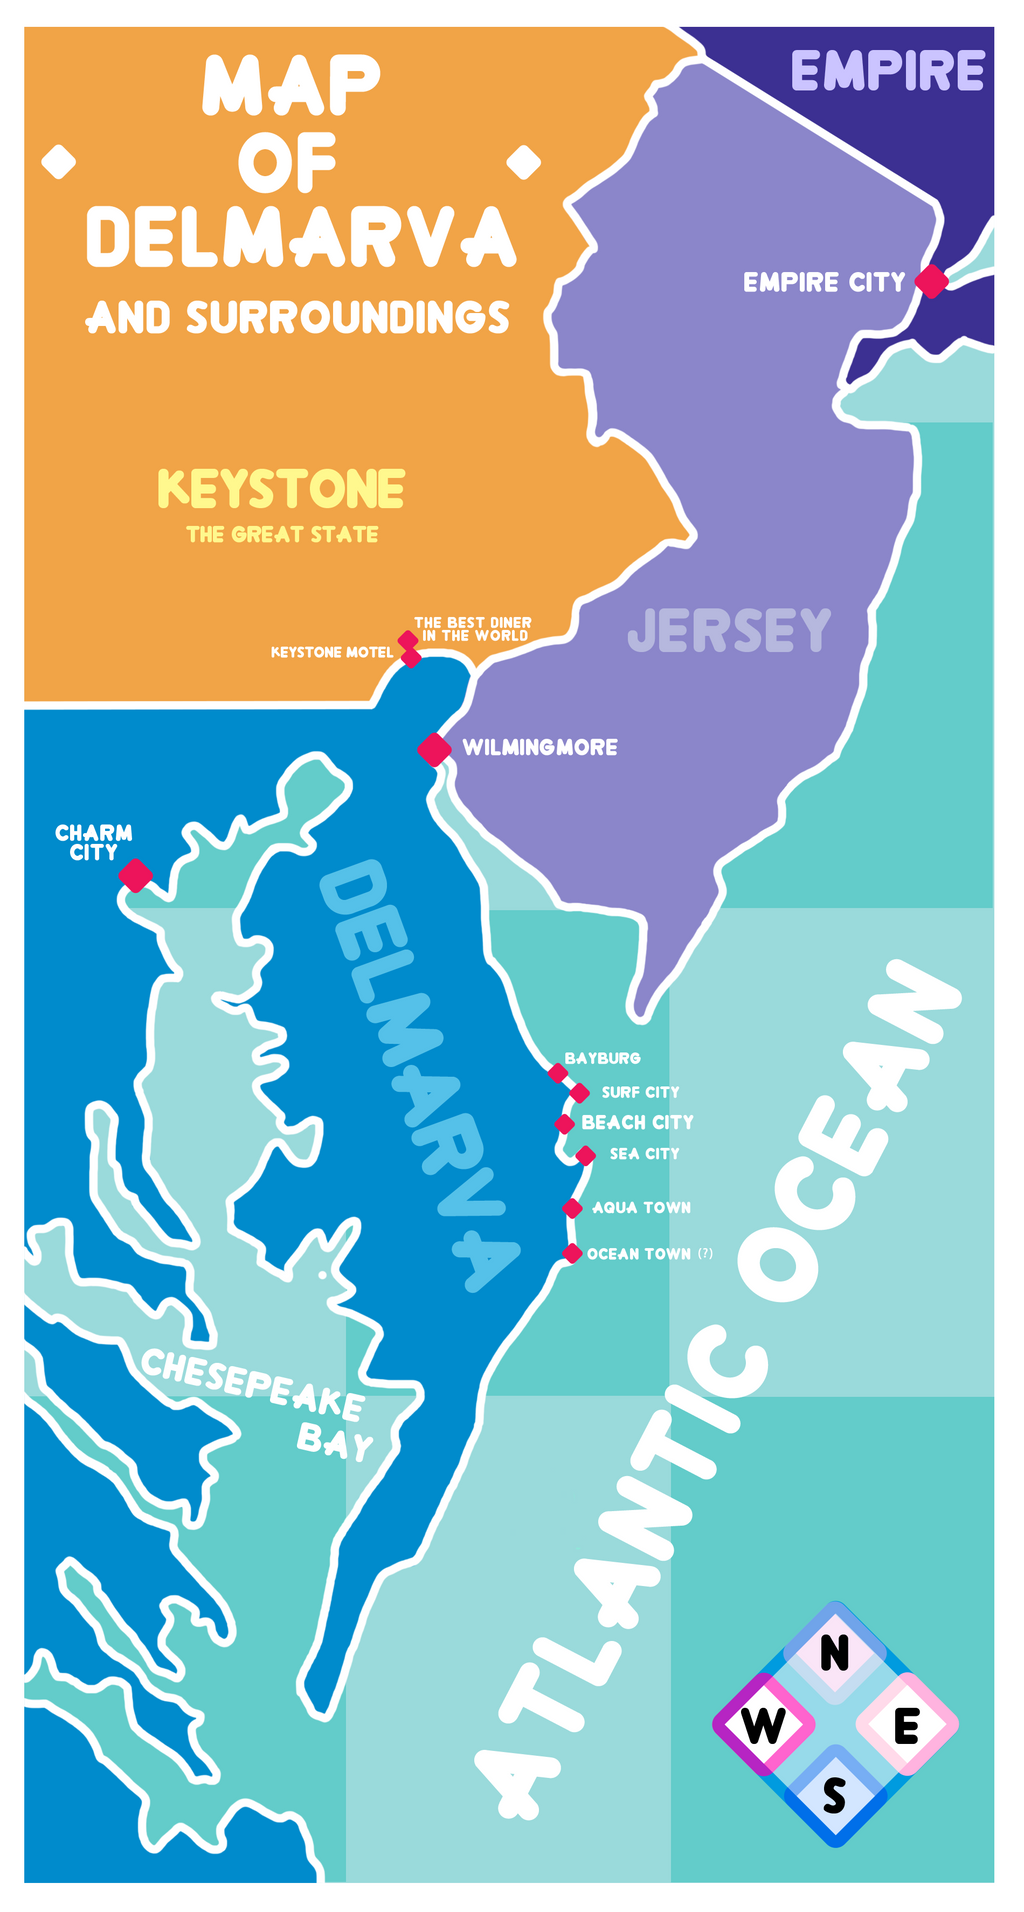 steven universe new map of delmarva by elledy92 on deviantart